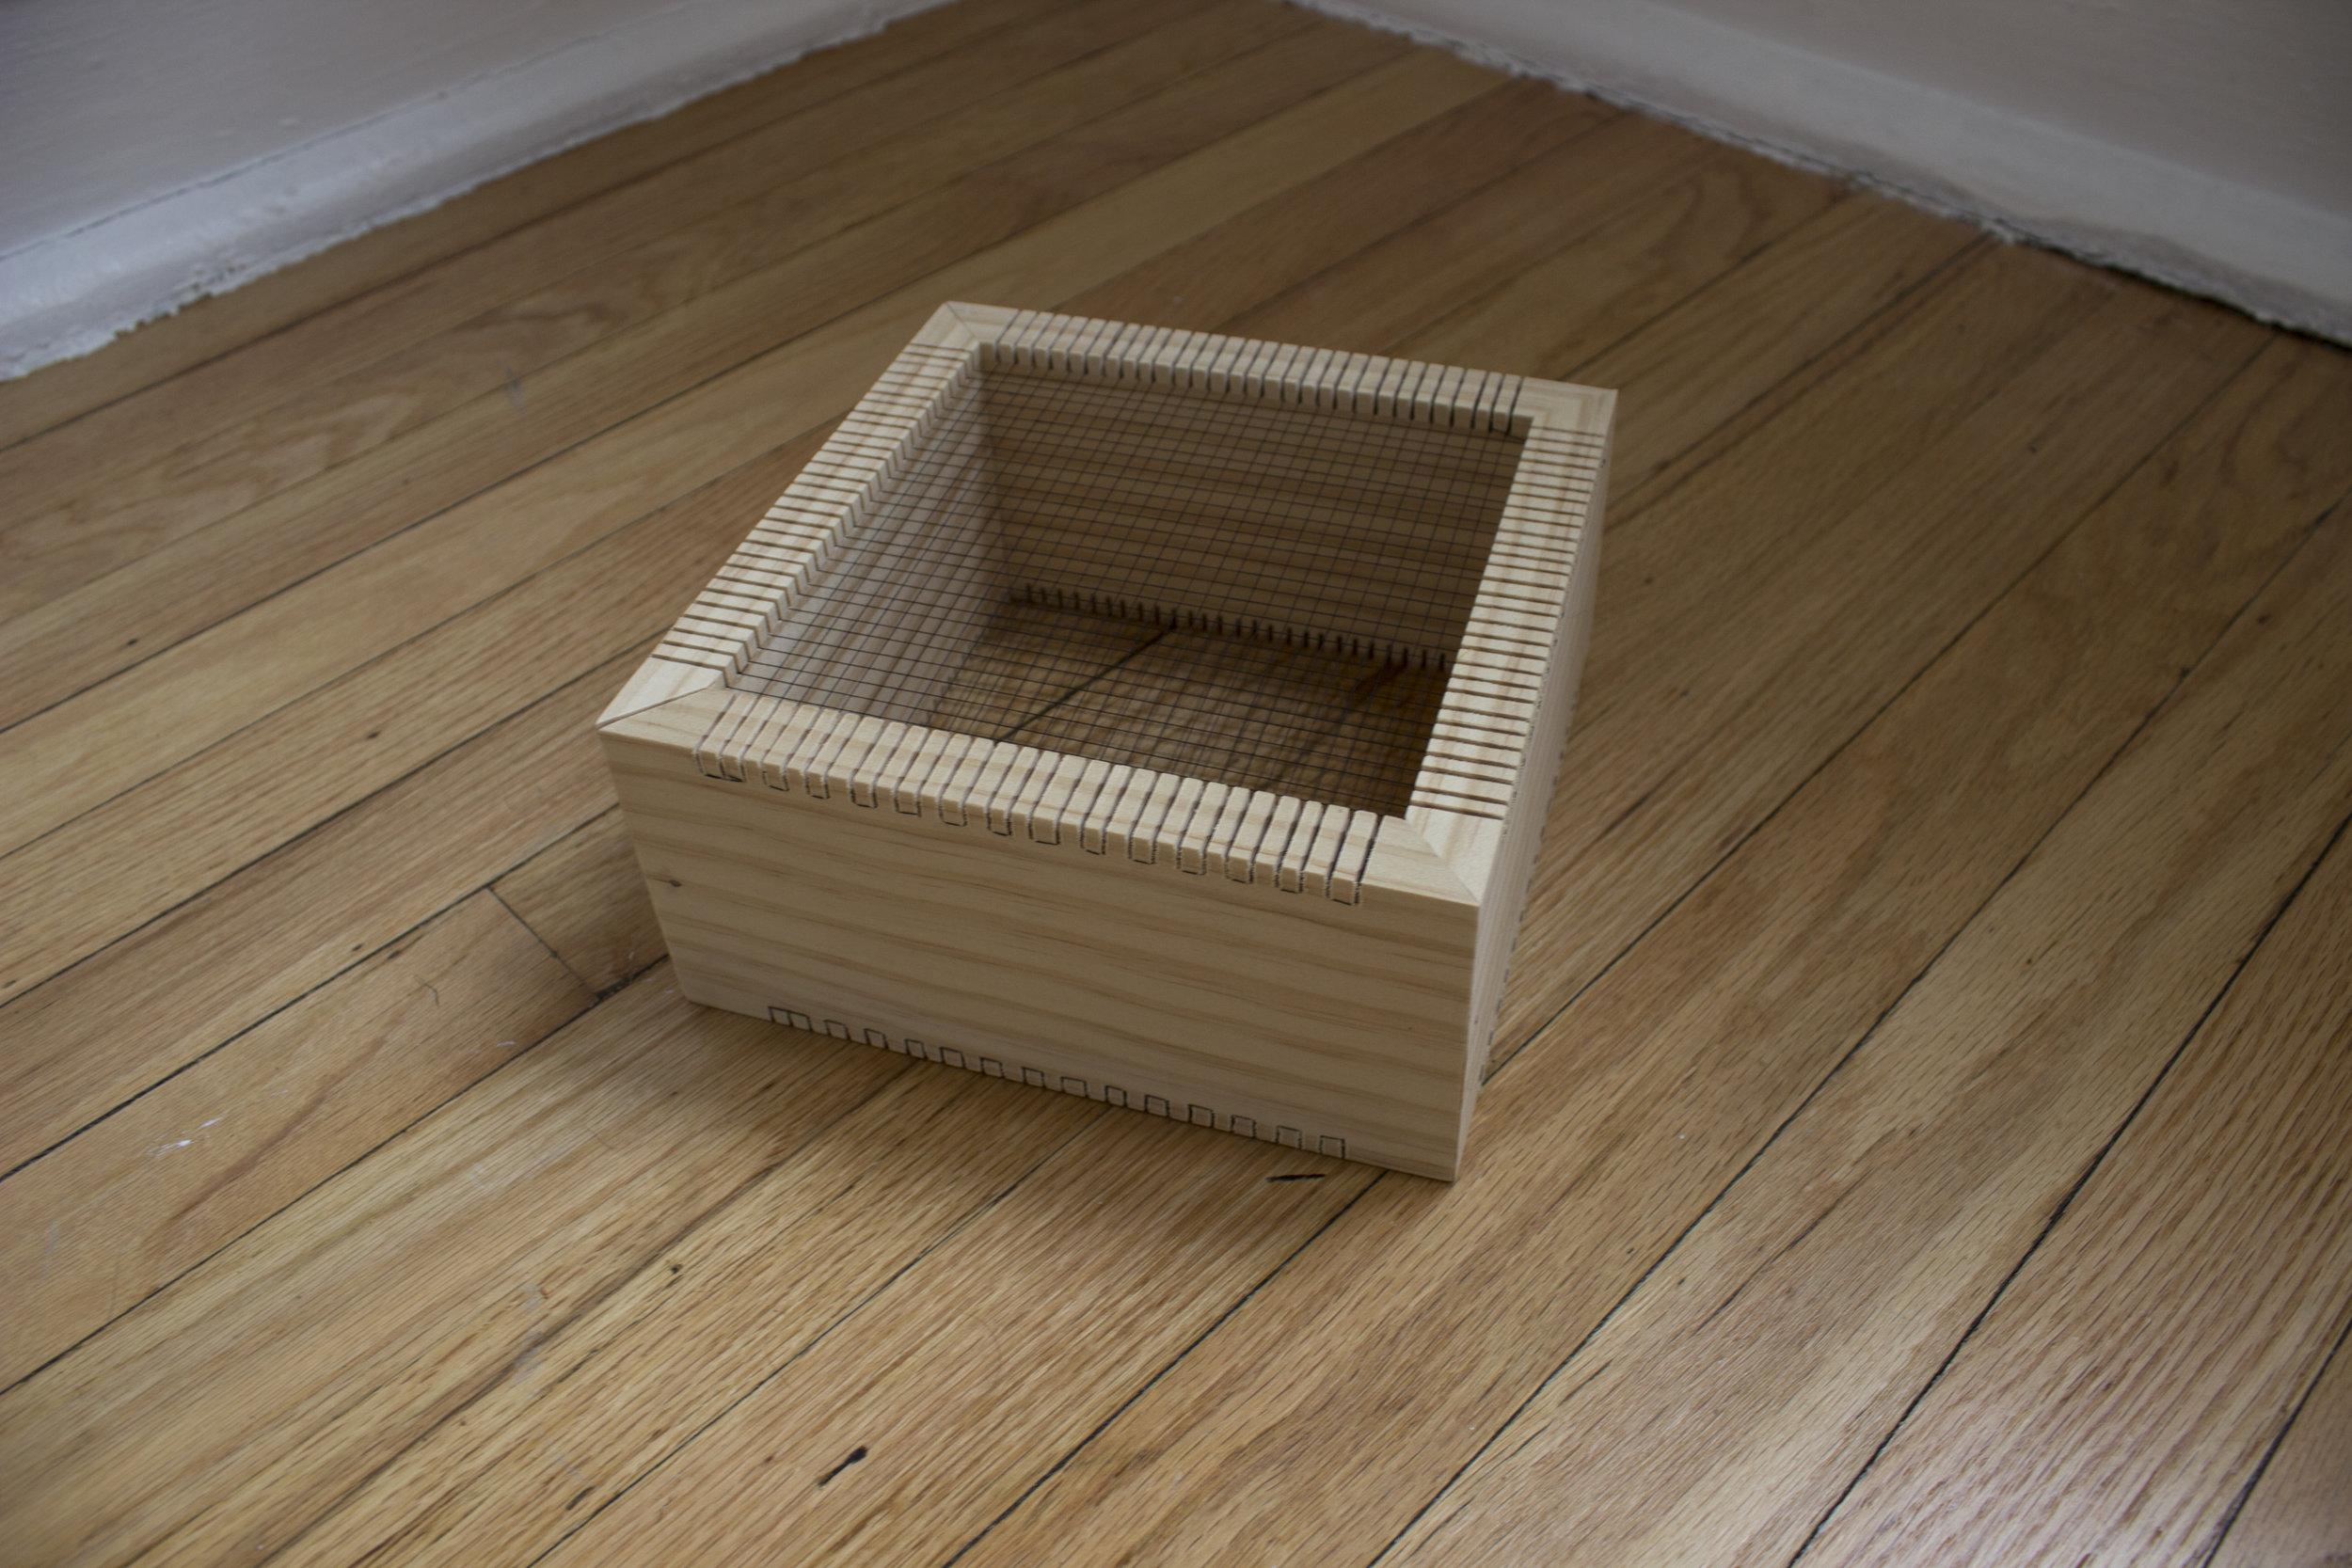 Tracie Hayes,  Two Quadrats, 2018,  Wood, thread